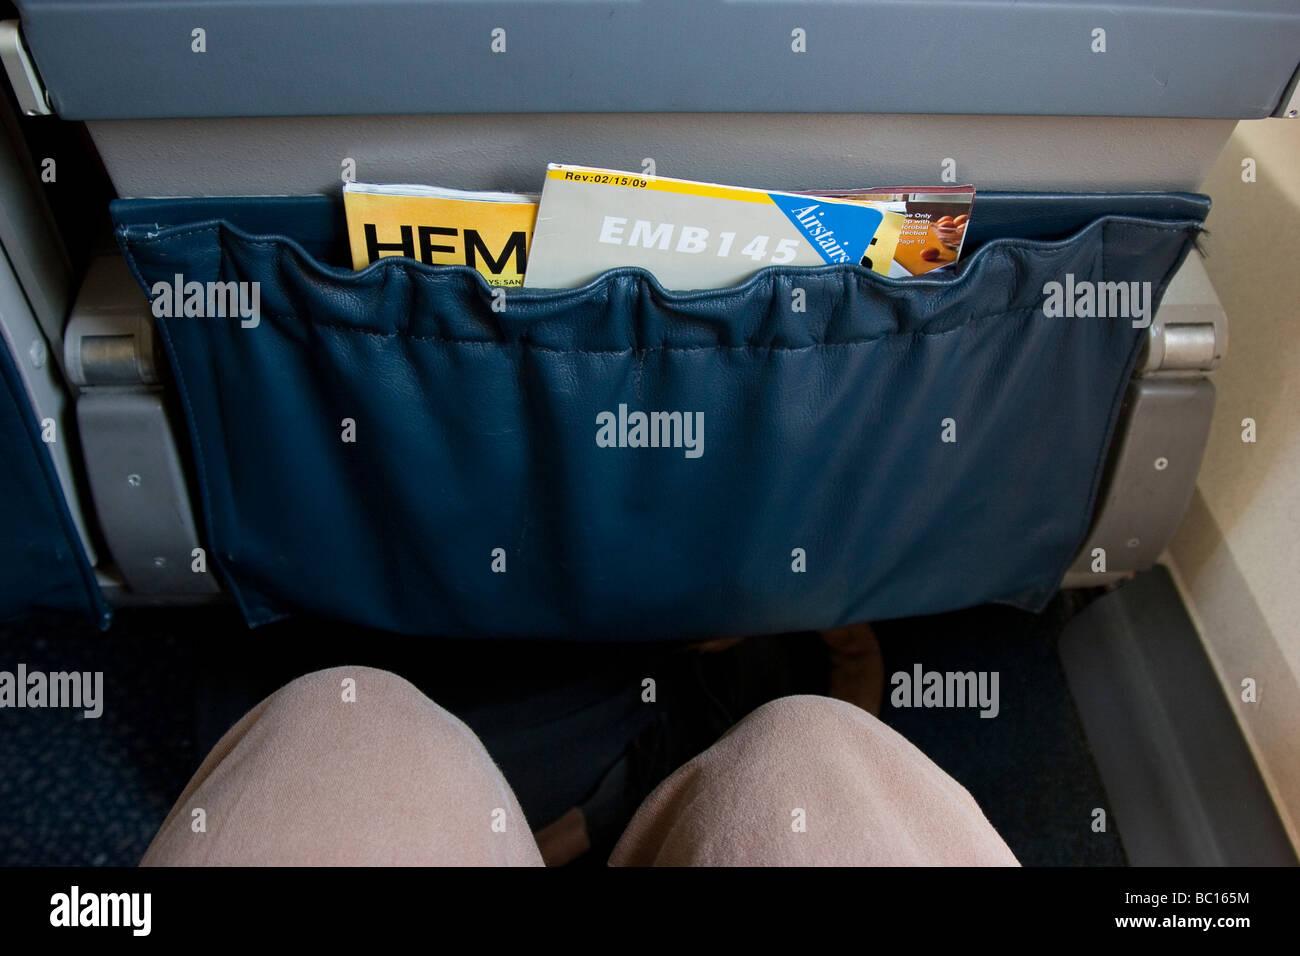 Mangel an Beinfreiheit im Flugzeug Economy-Sitz Stockbild